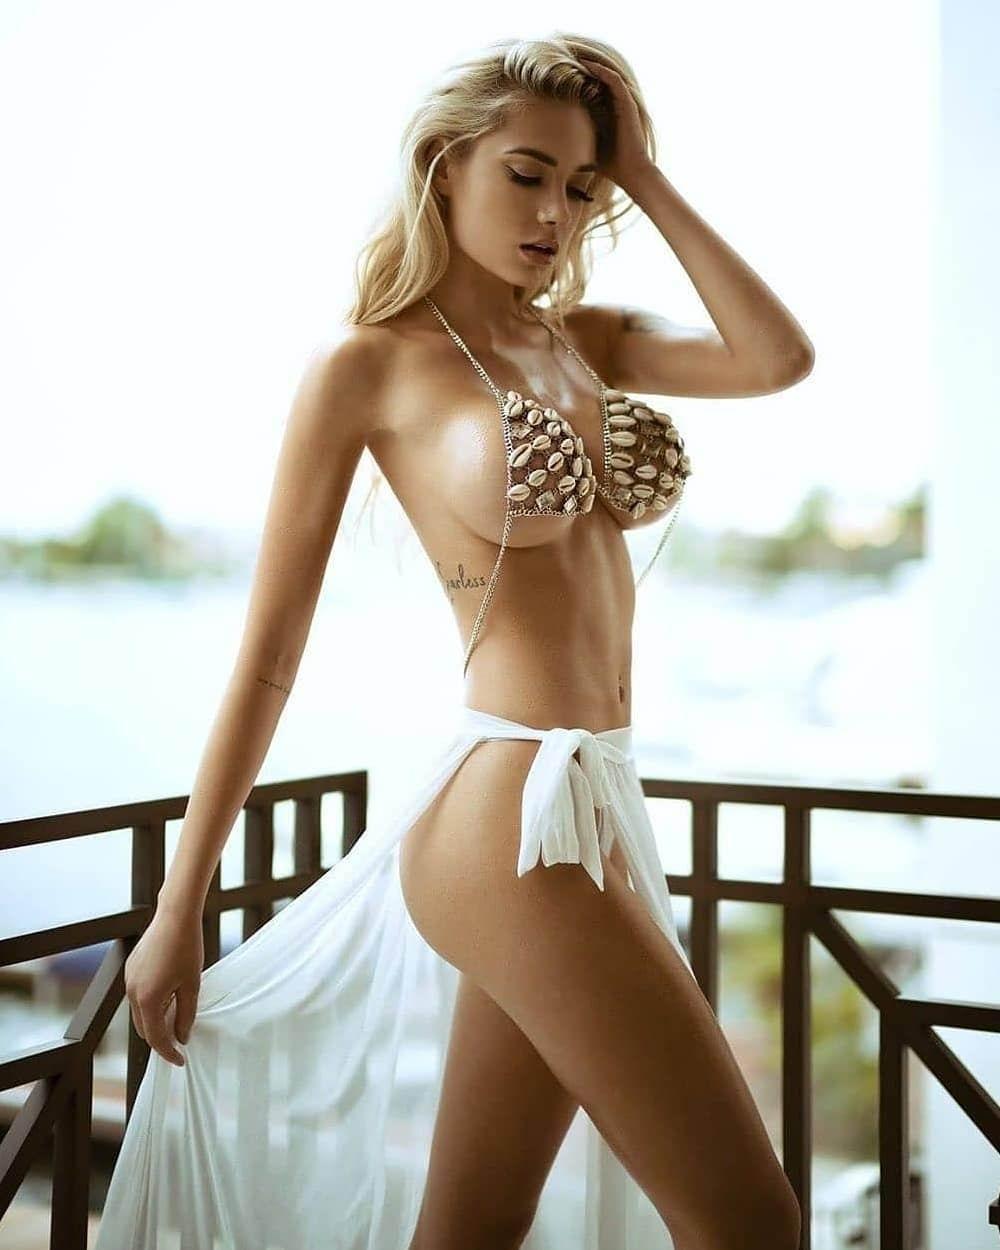 Эскорт модель Аня